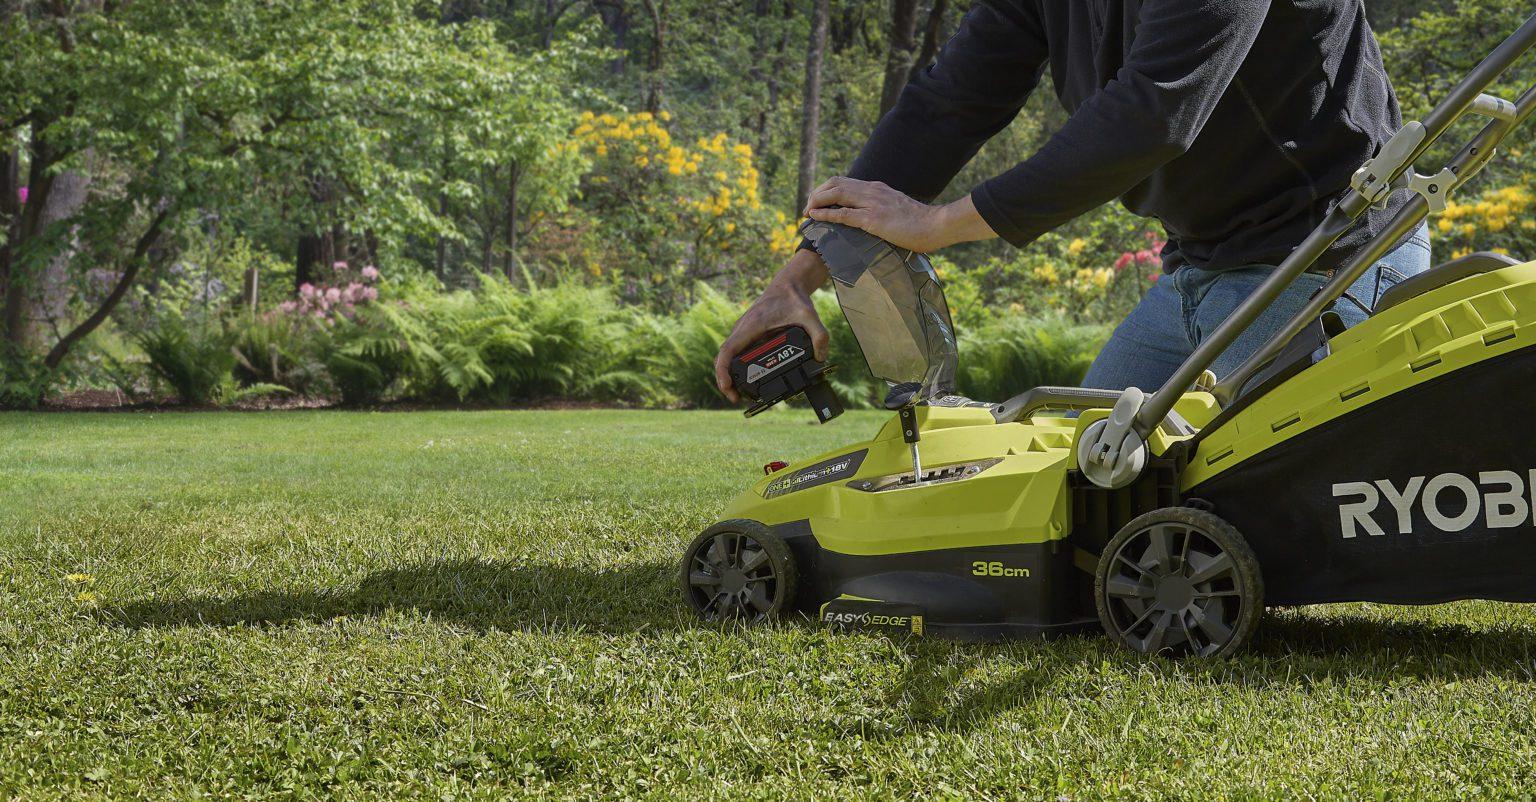 Ryobi One+ lawn mower with Bosch Professional 18V battery